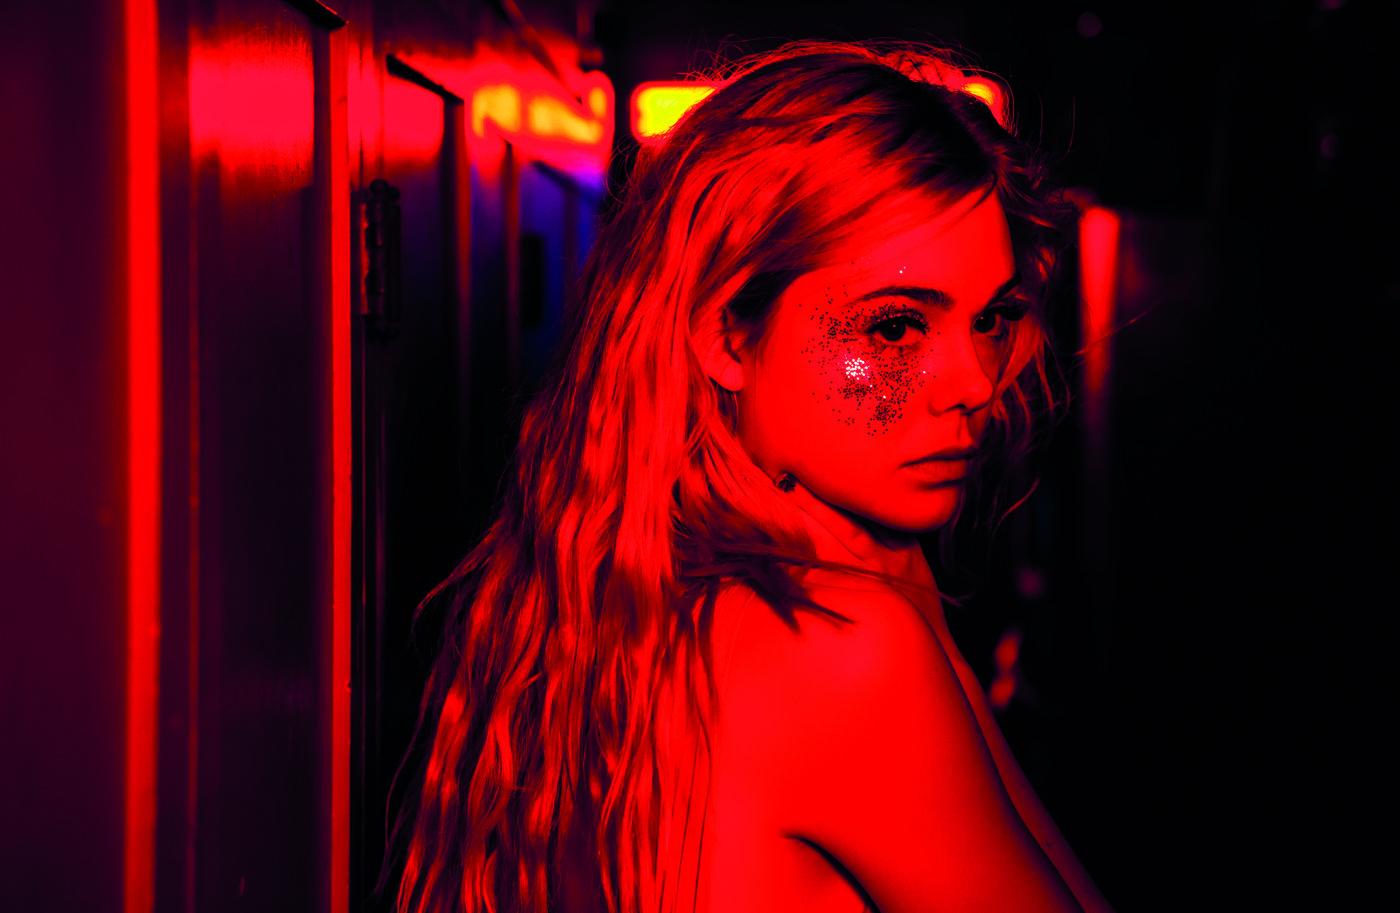 The Neon Demon Wallpapers Wallpaper Cave